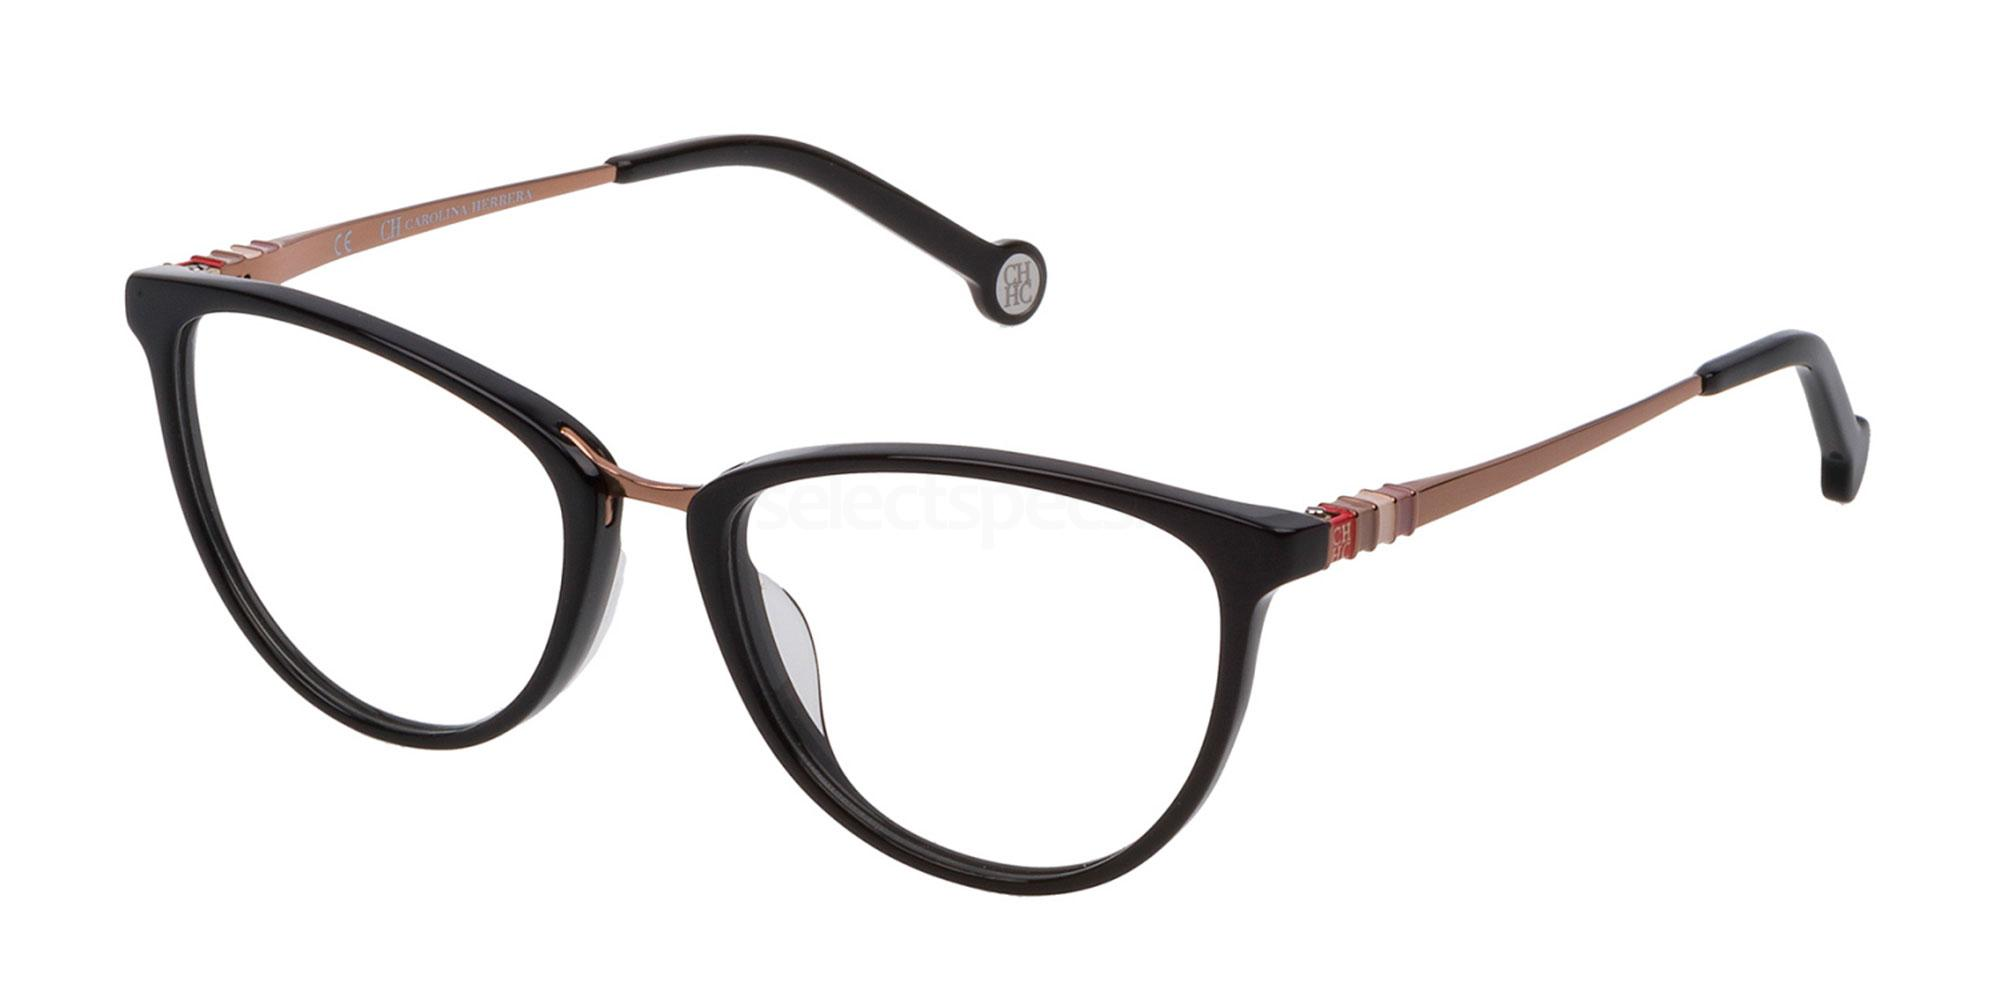 0700 VHE778 Glasses, CH Carolina Herrera